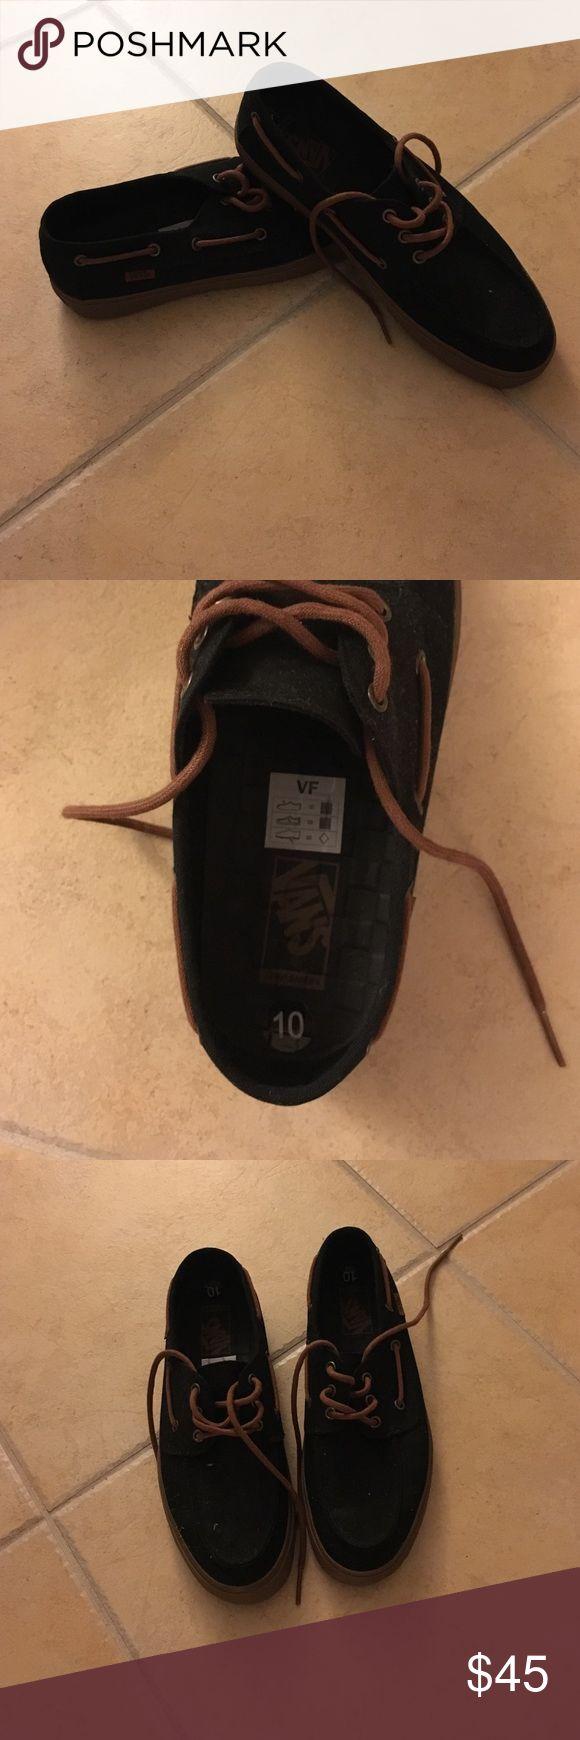 Vans Boat Shoes Black/Brown Vans Boat Shoes. Size: 10. New and never worn. Vans Shoes Boat Shoes